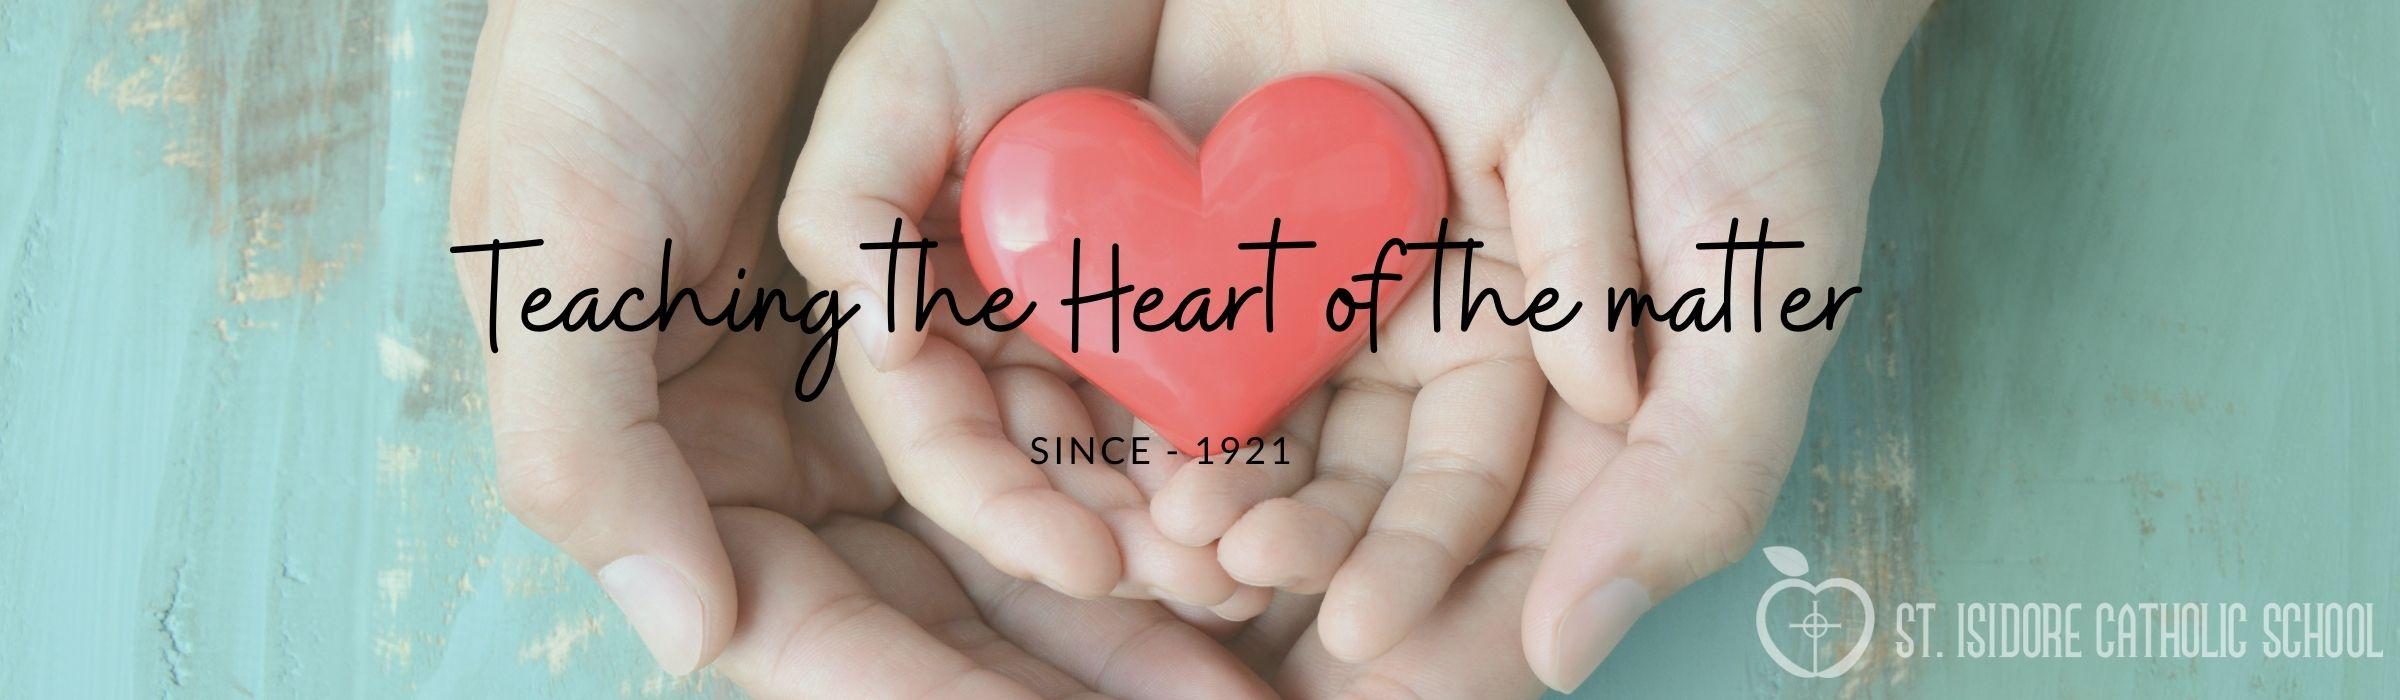 SICS-Teaching-the-Heart-of-the-Matter-banner